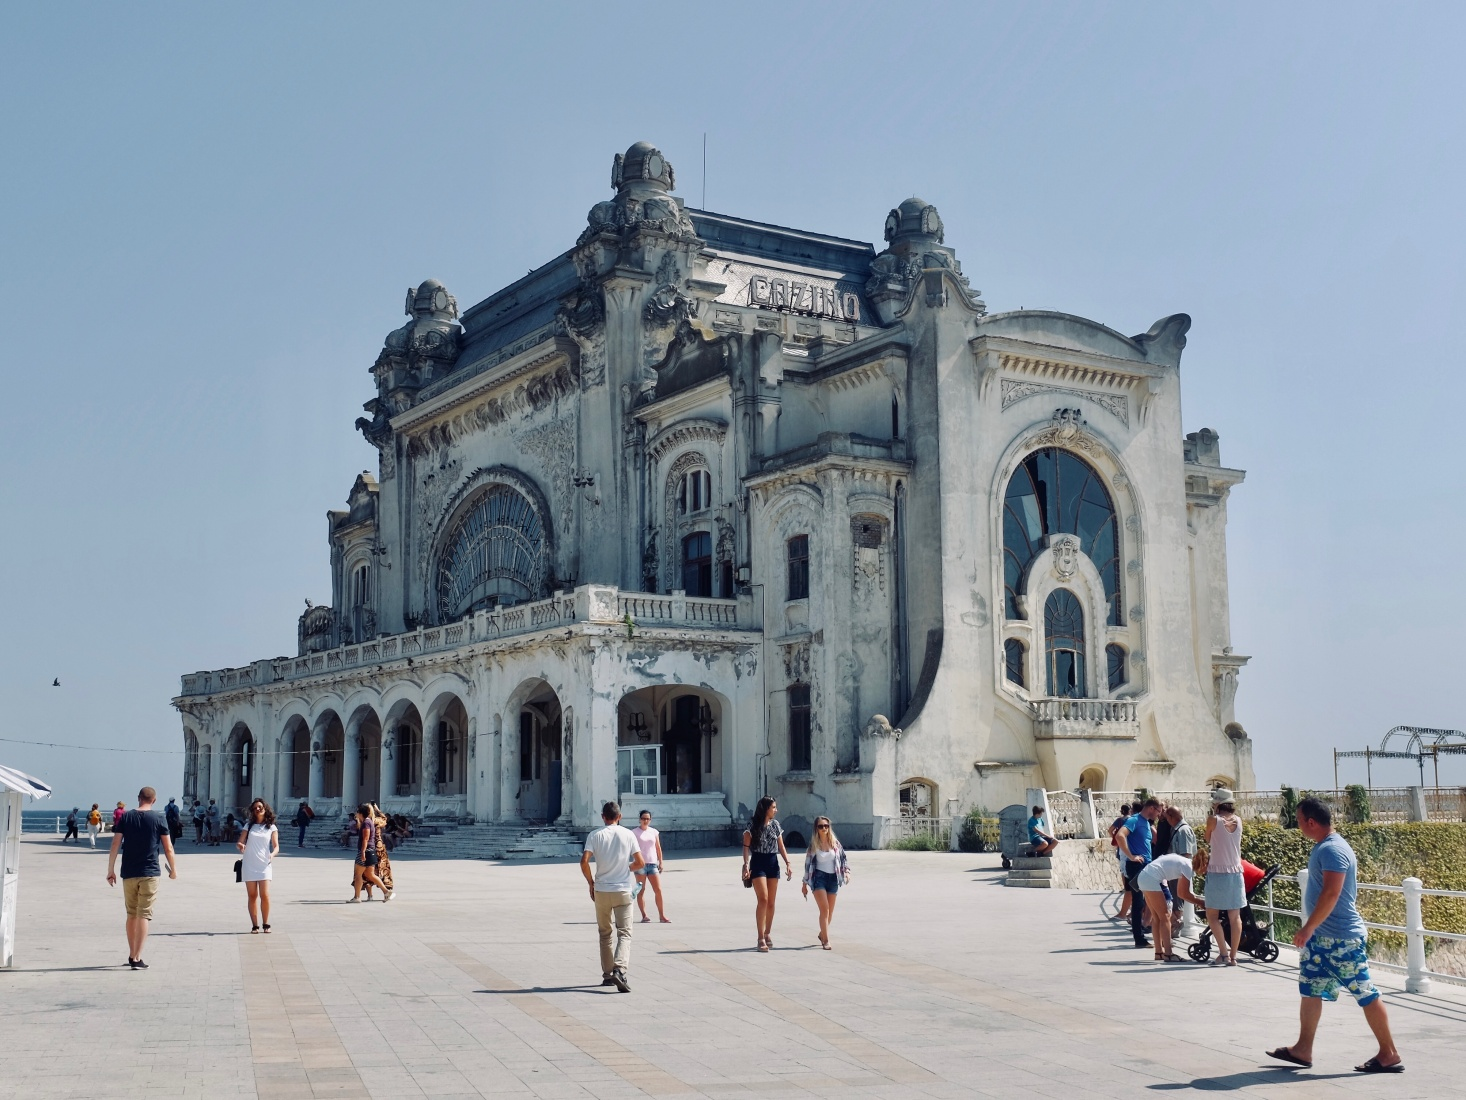 The abandoned Constanța Casino, on the main seaside promenade in Constanța, Romania.